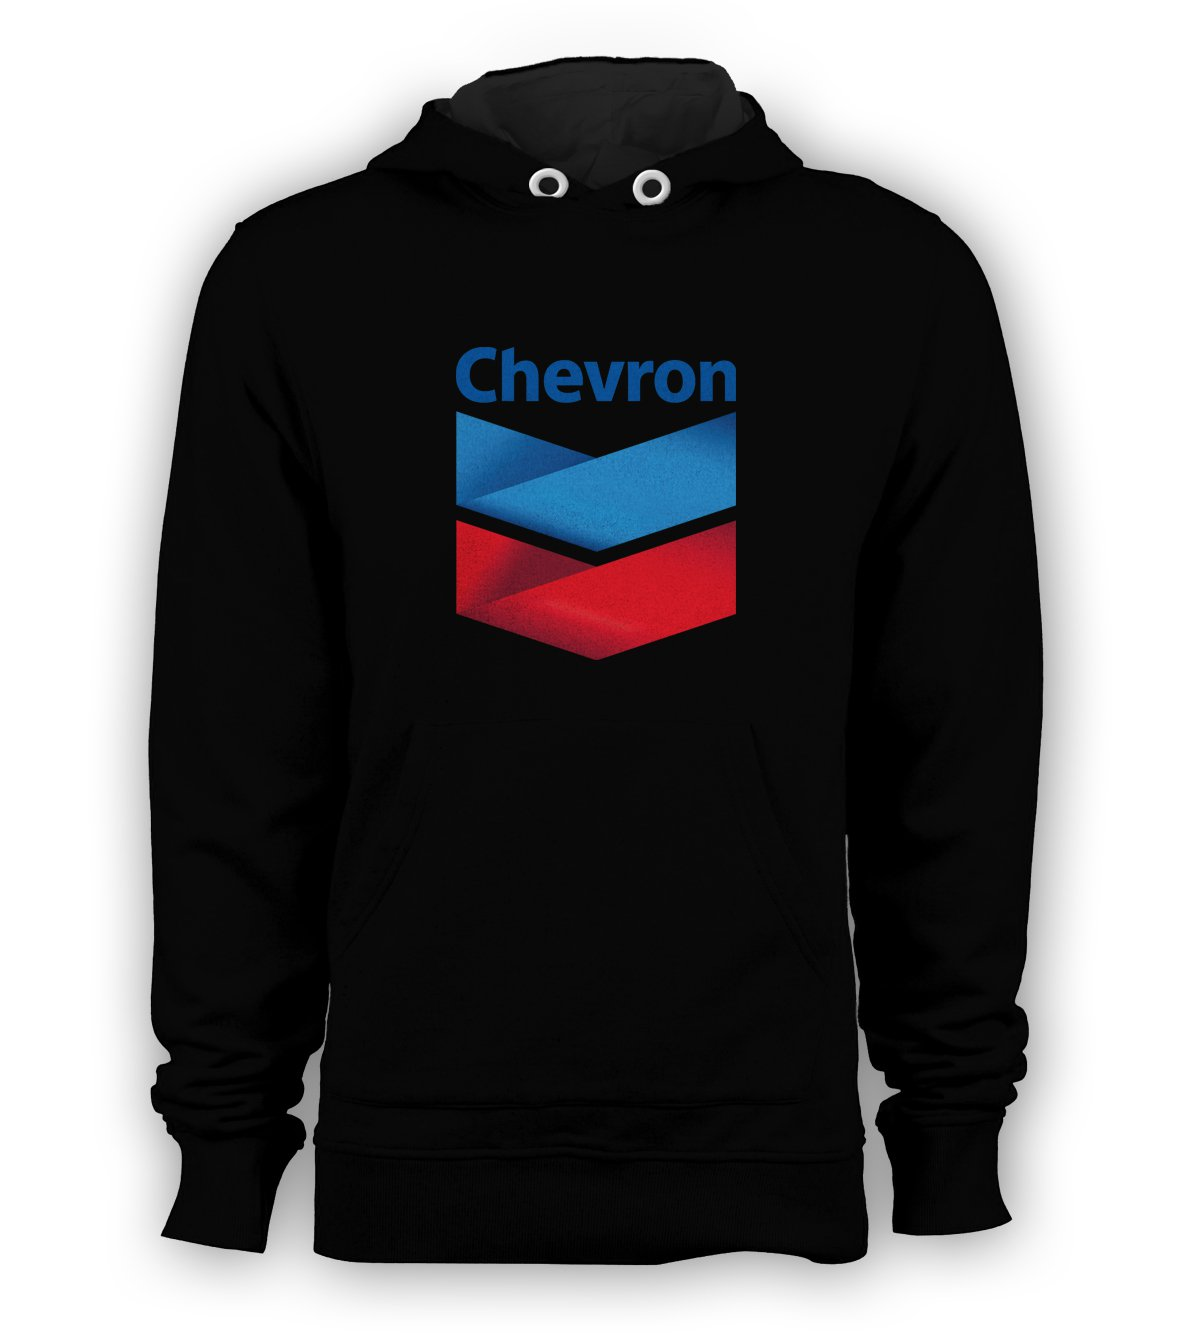 Chevron Logo Pullover Hoodie Men Sweatshirts Size S to 3XL New Black